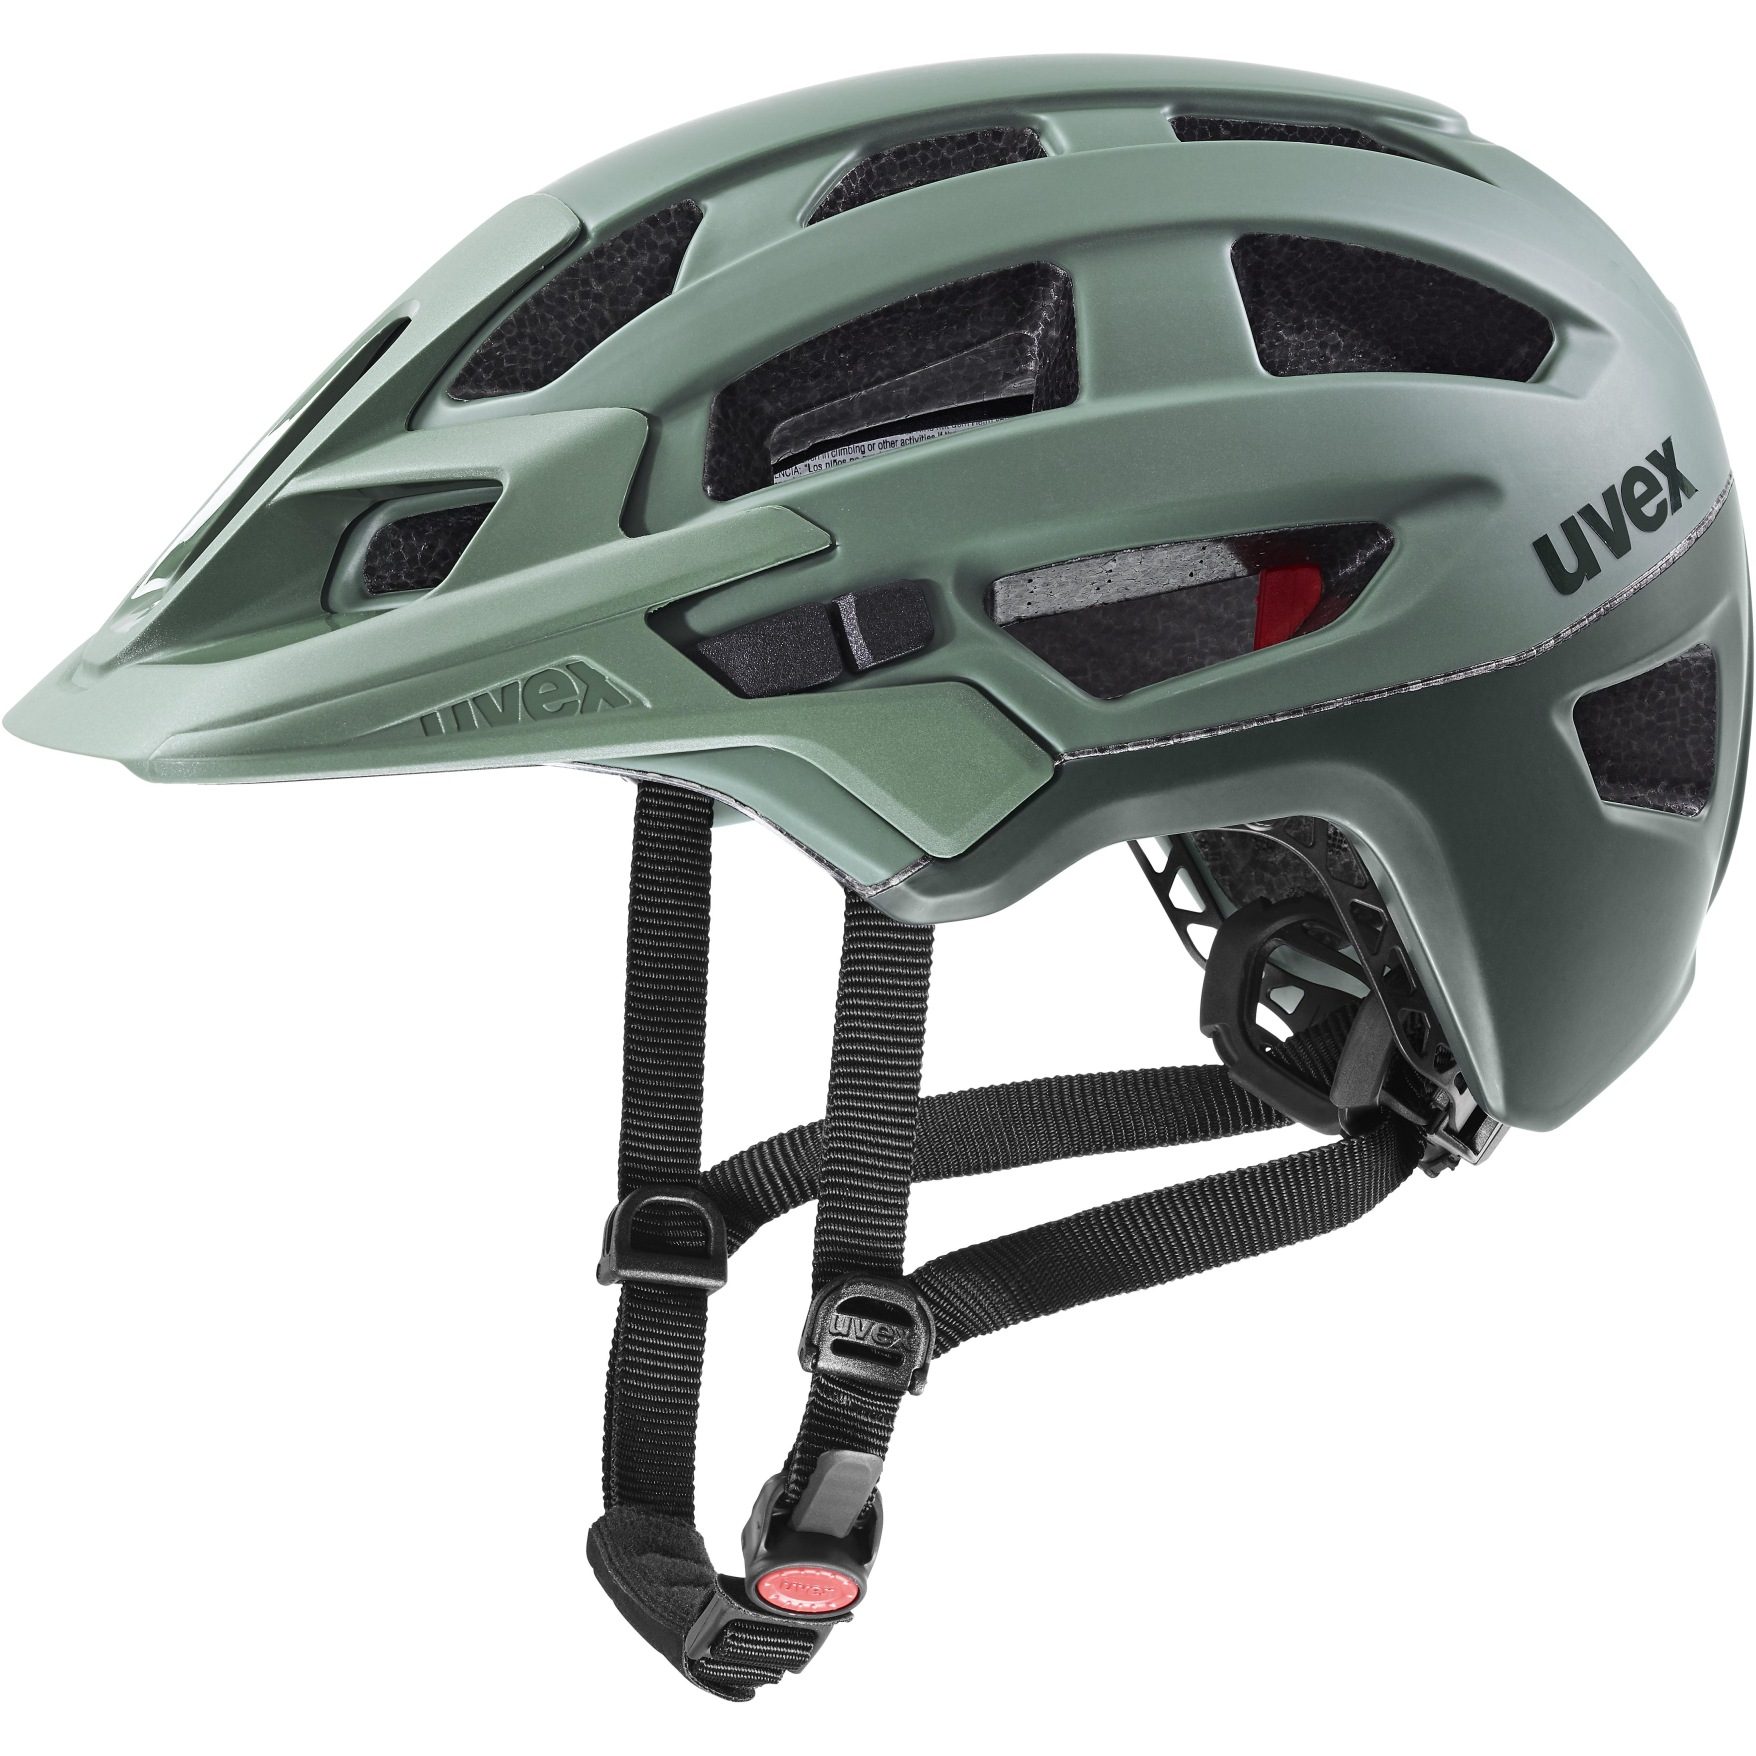 Uvex finale 2.0 Helmet - moss green mat